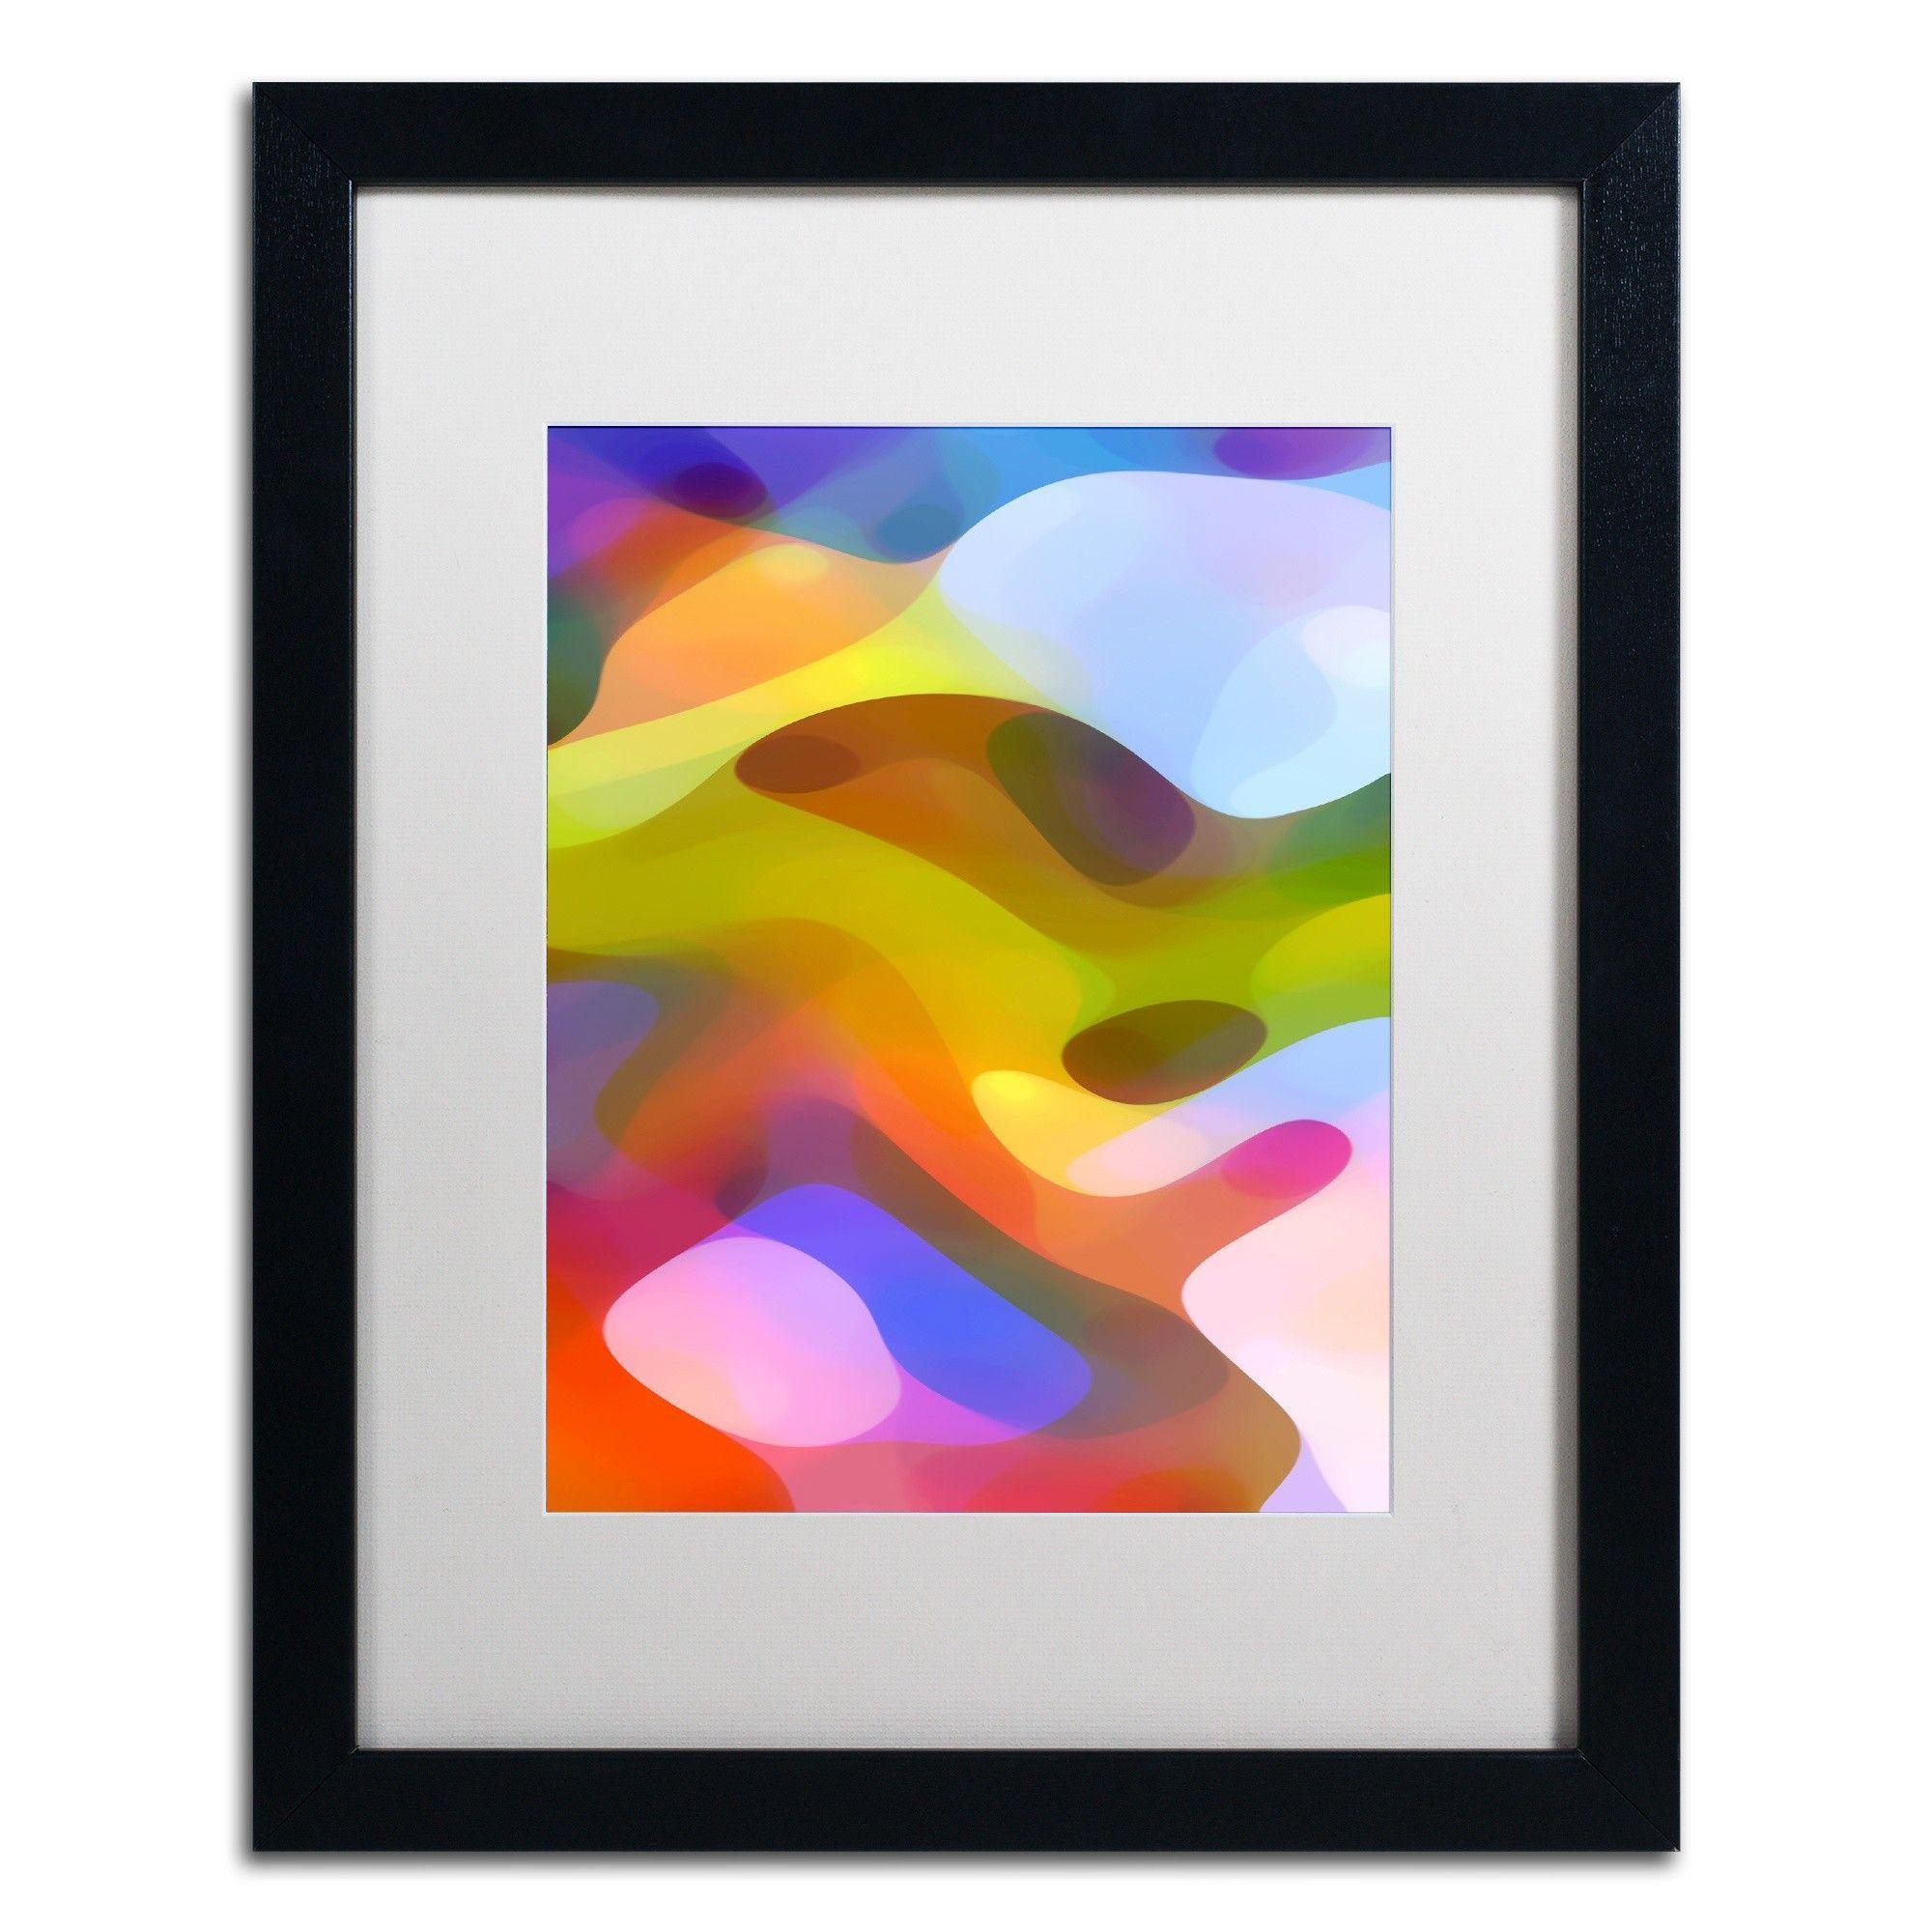 'Dappled Light 7' by Amy Vangsgard Framed Graphic Art